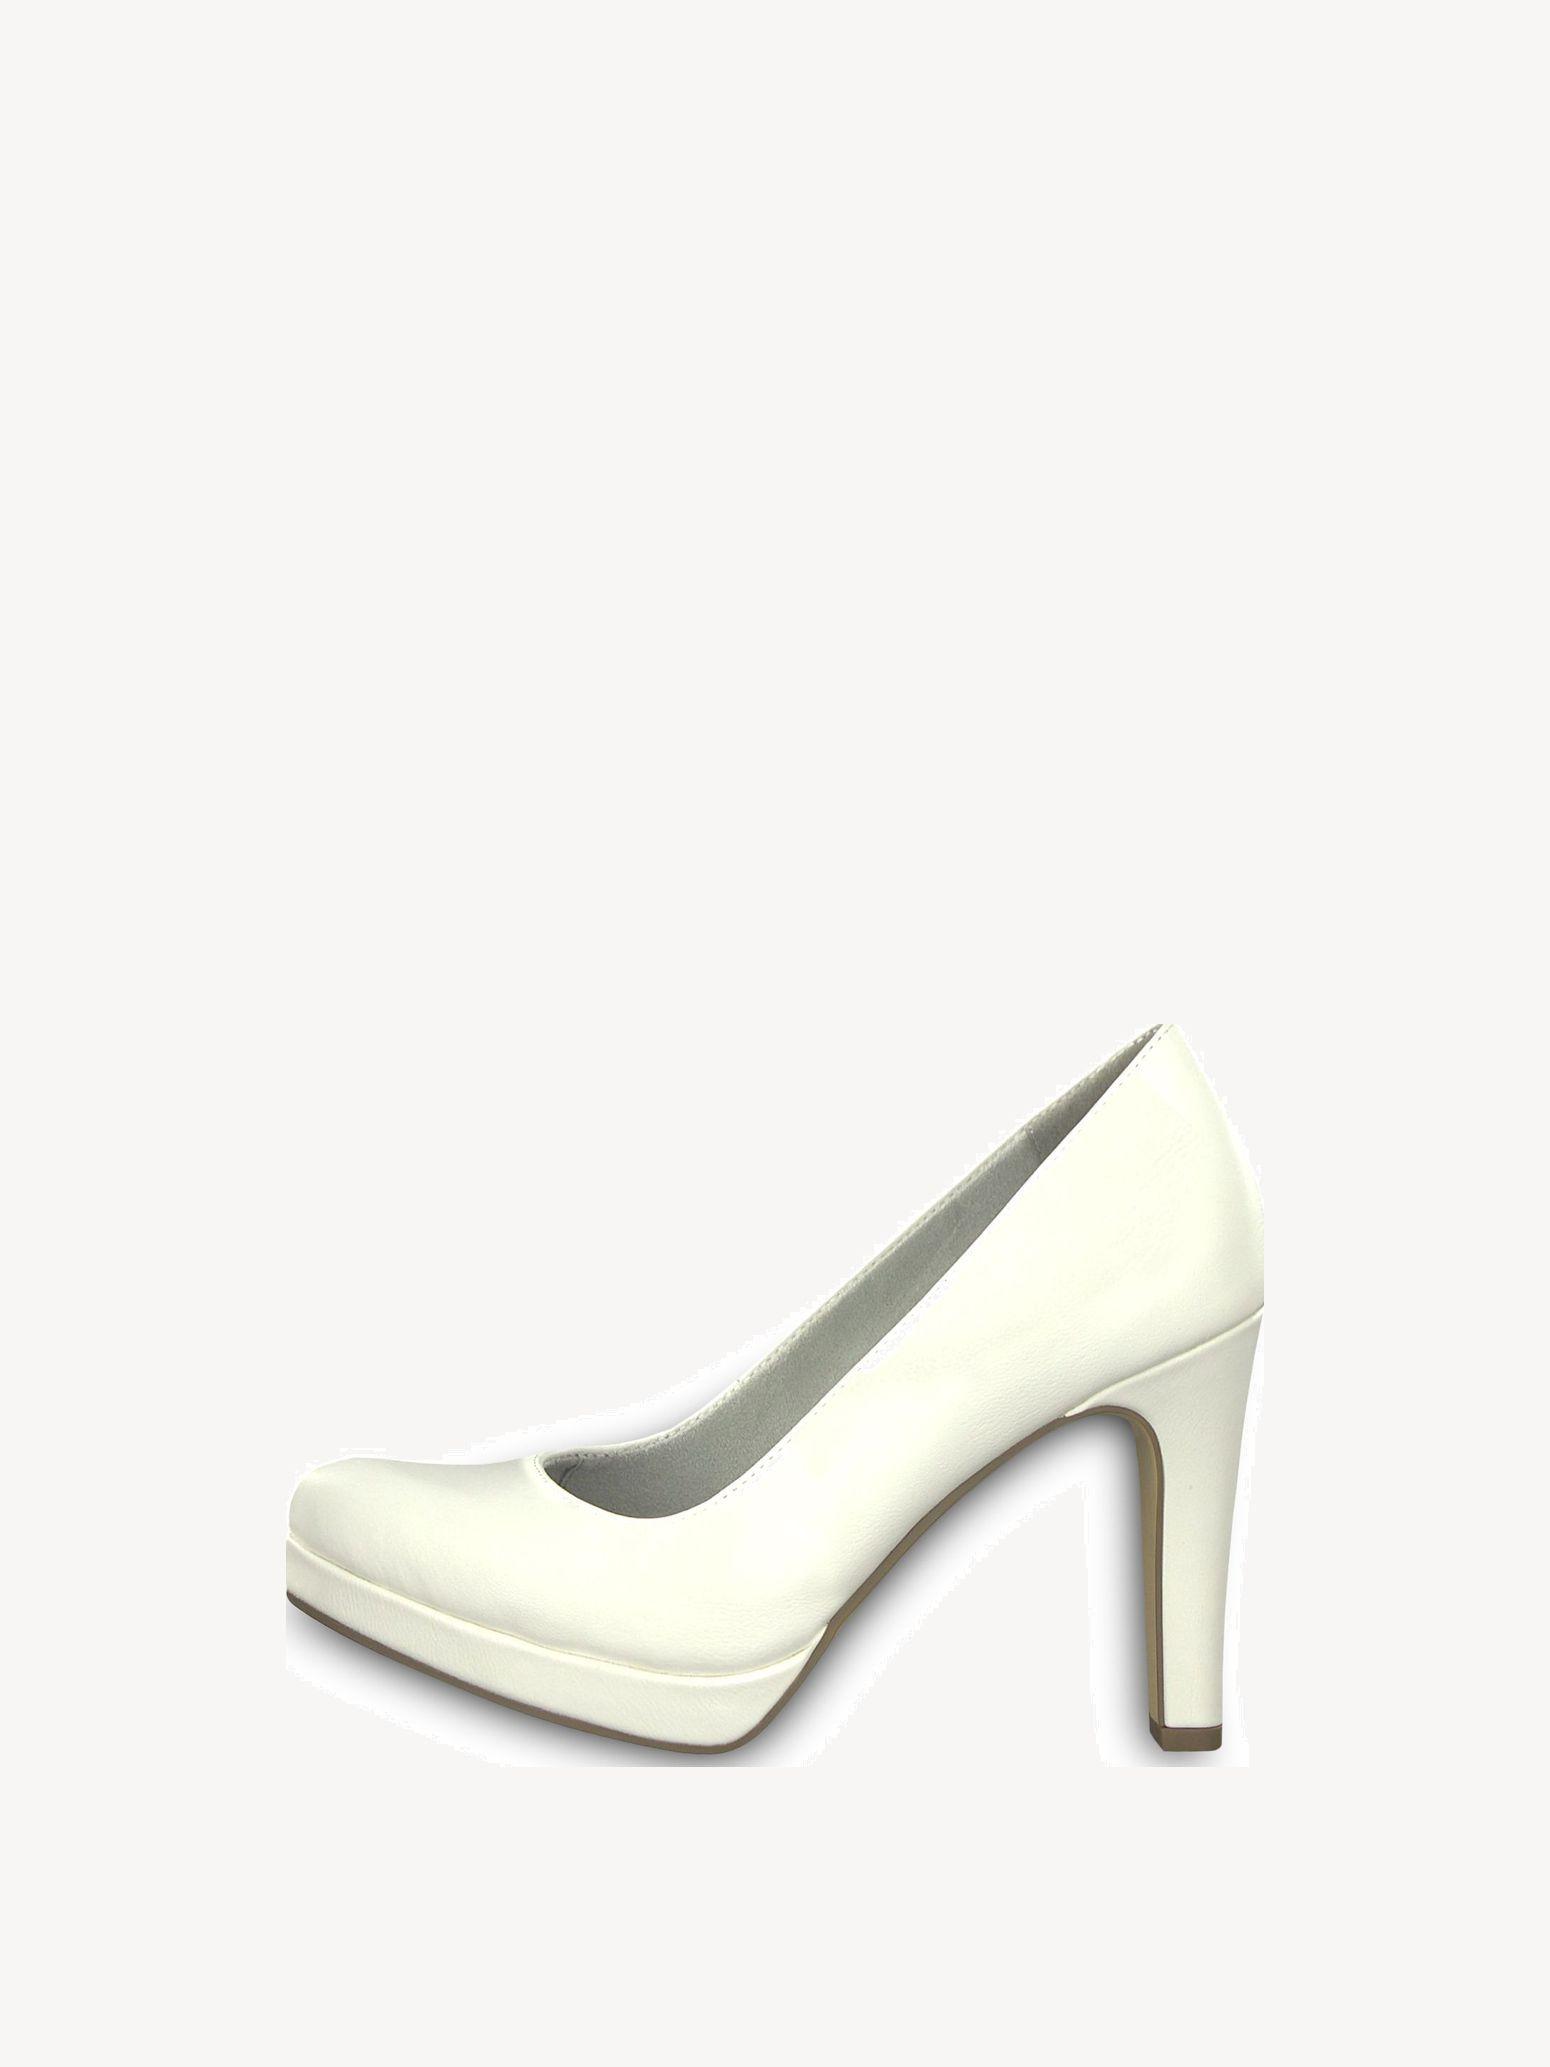 TamarisHigh heels - white hStwp7B5jd